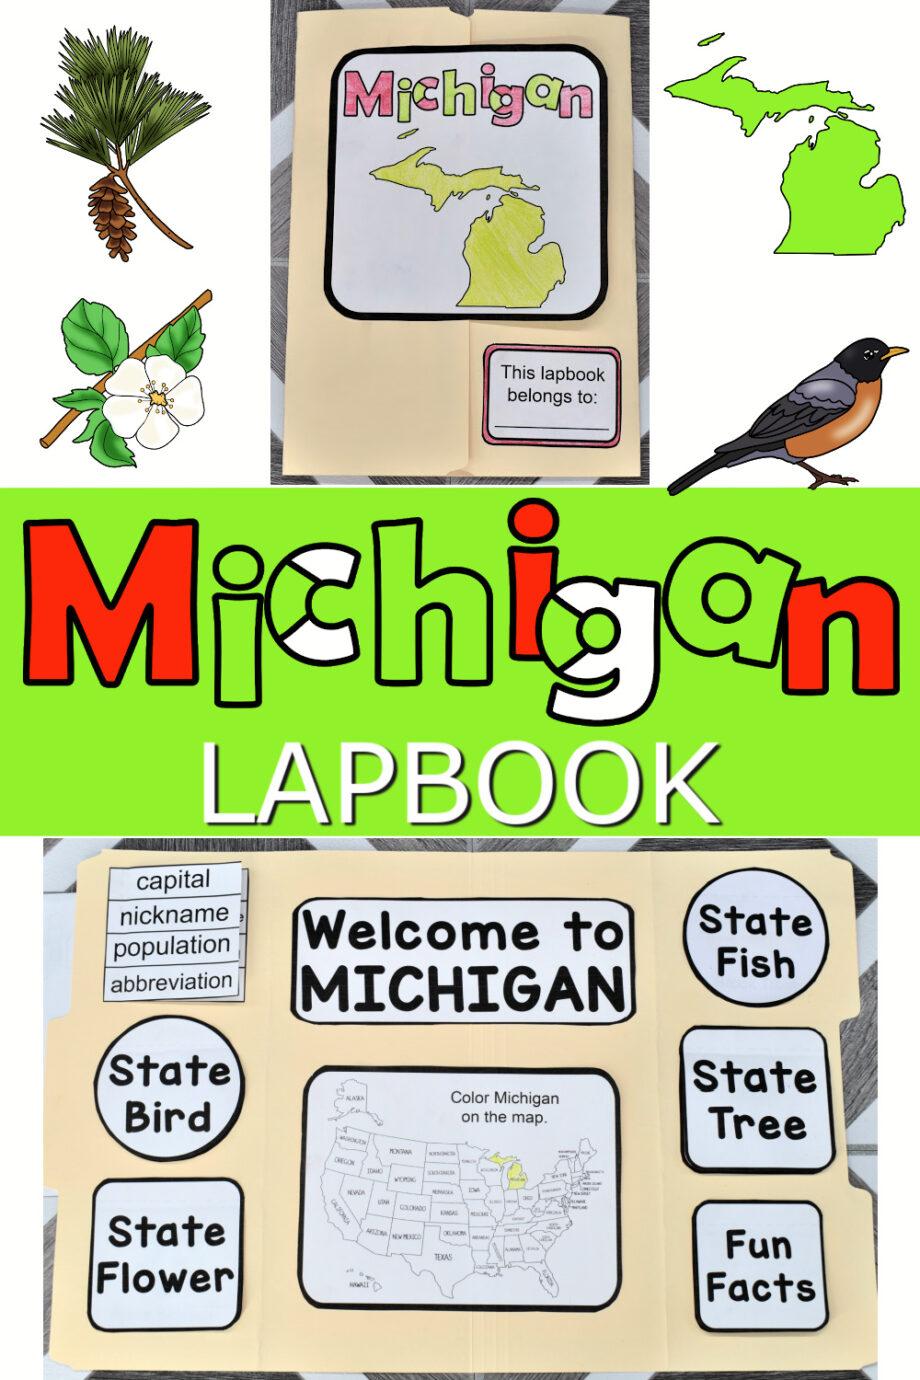 Michigan Lapbook Elements